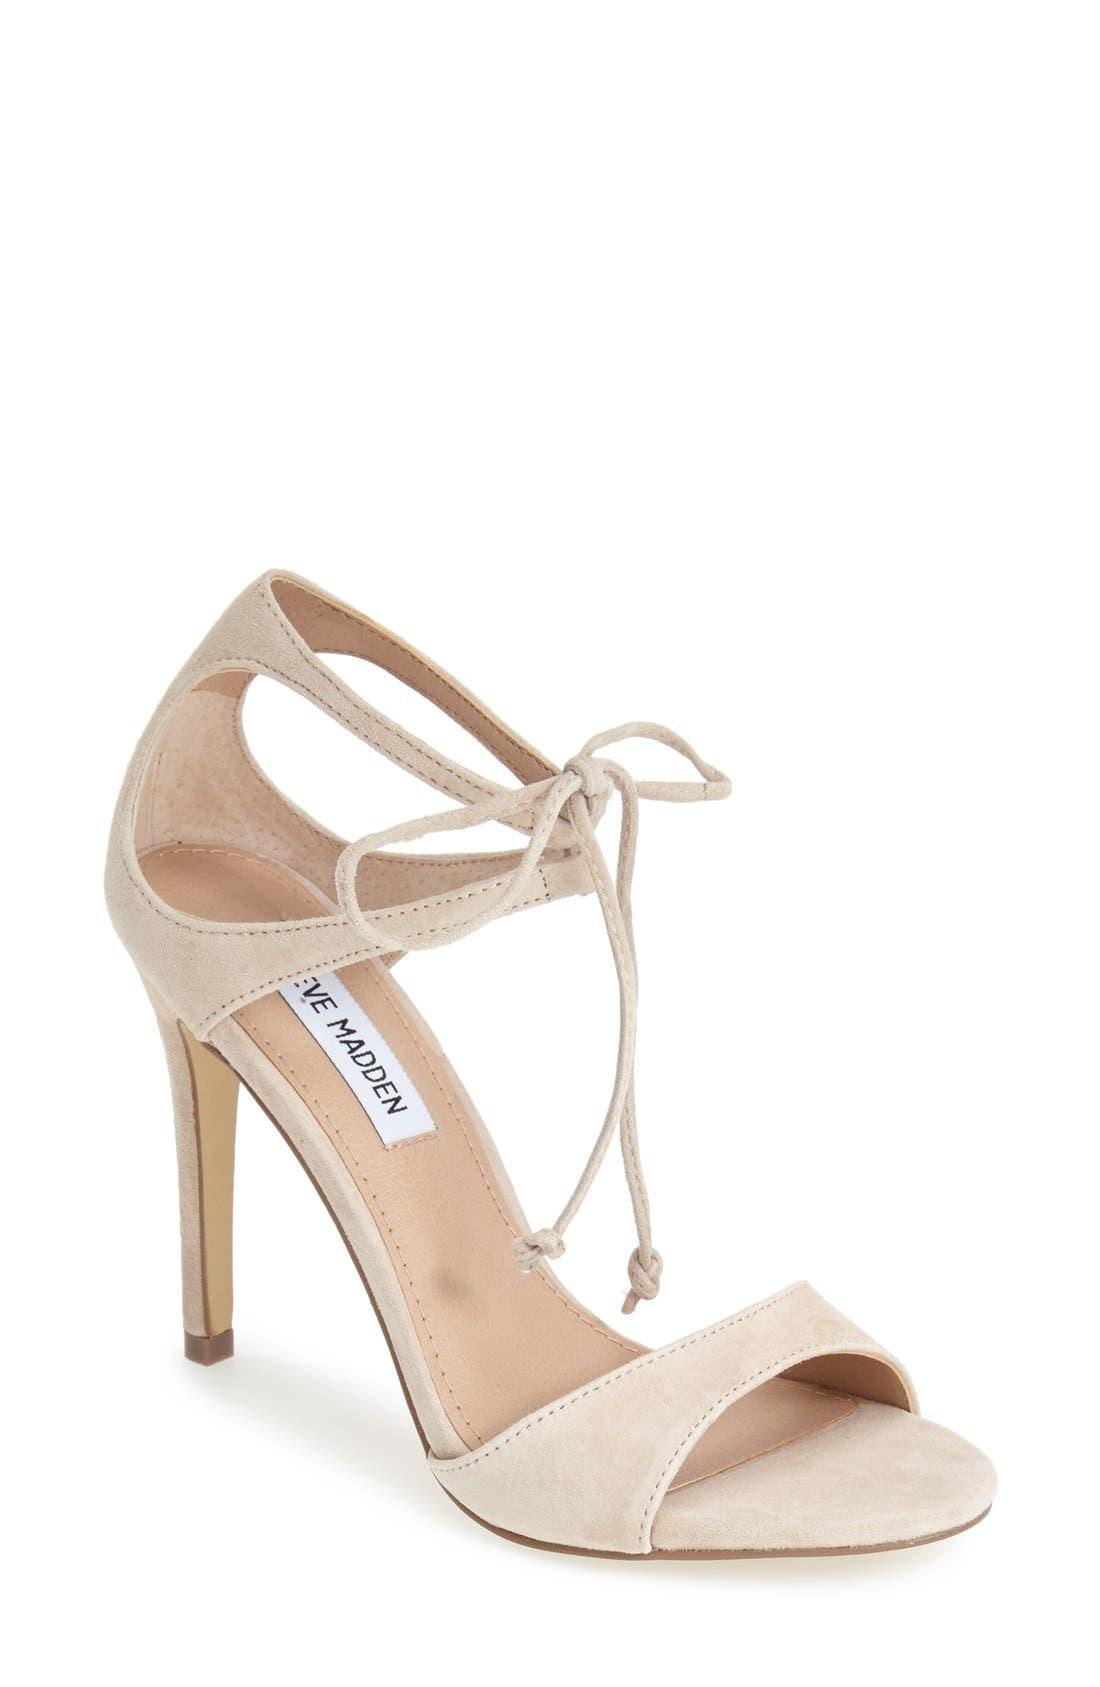 Alternate Image 1 Selected - Steve Madden 'Semona' Suede Ankle Strap Sandal (Women)